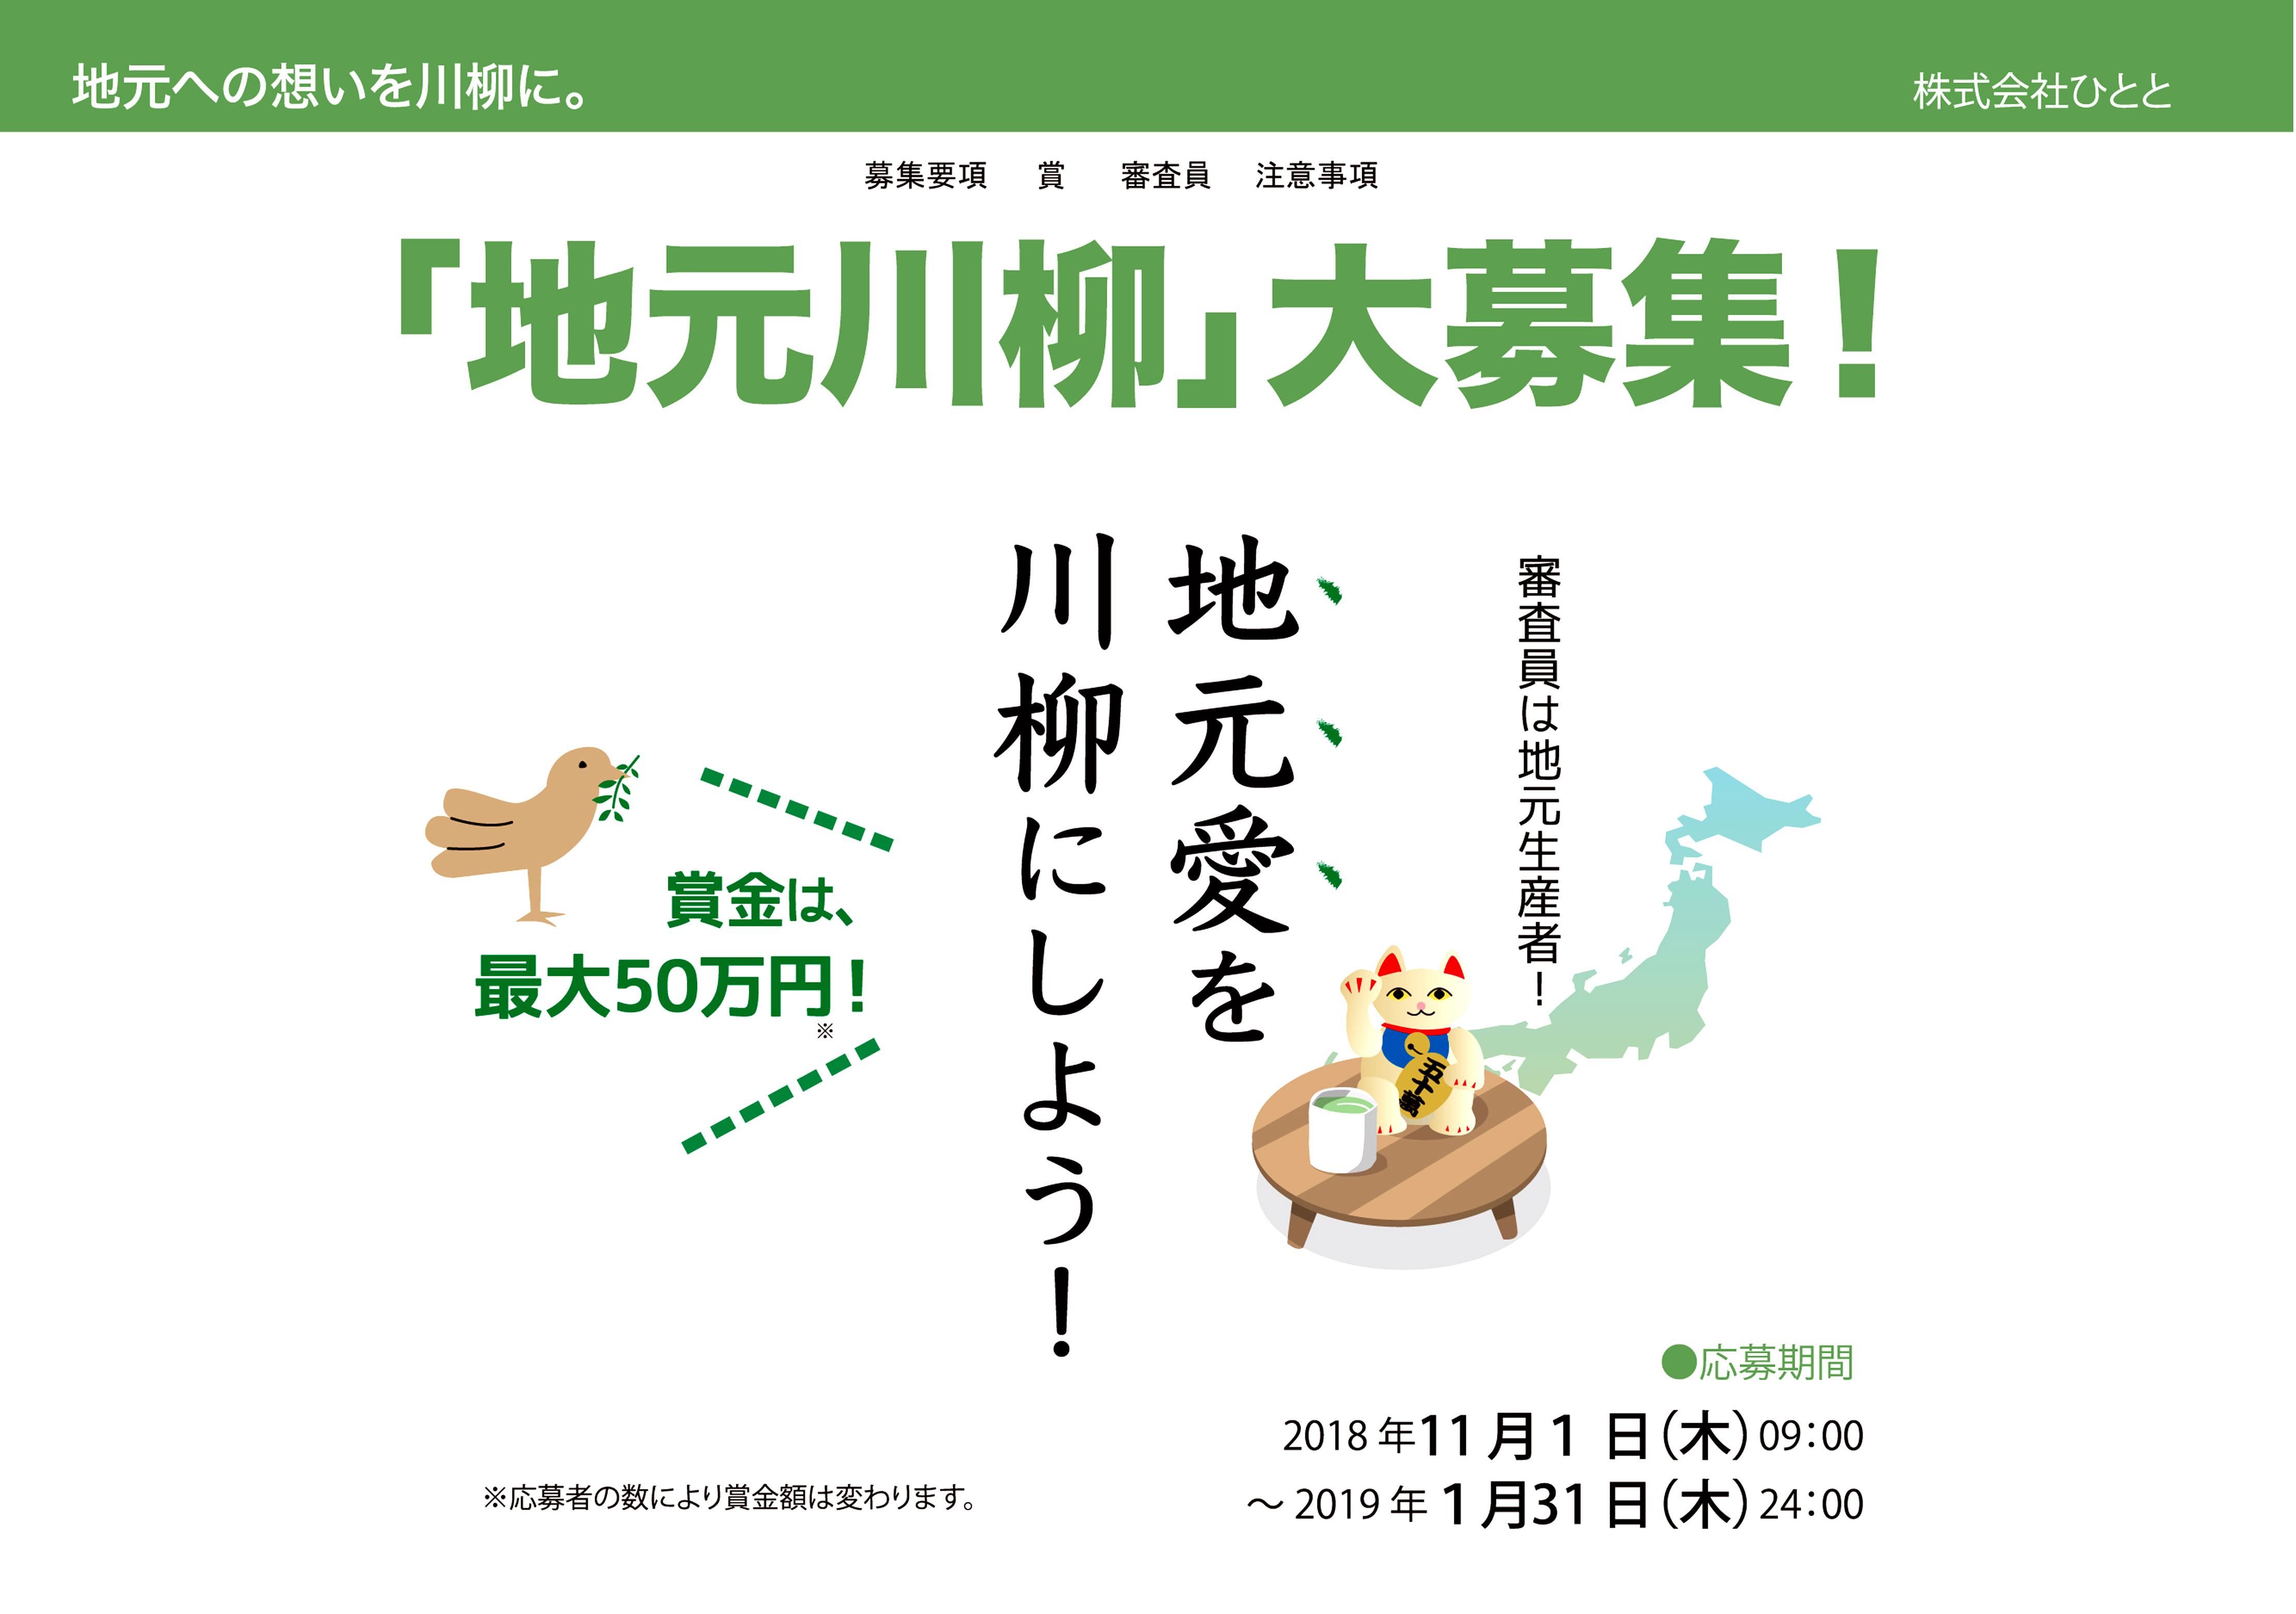 Take your local love to Kawagaya! Maximum prize is 500,000